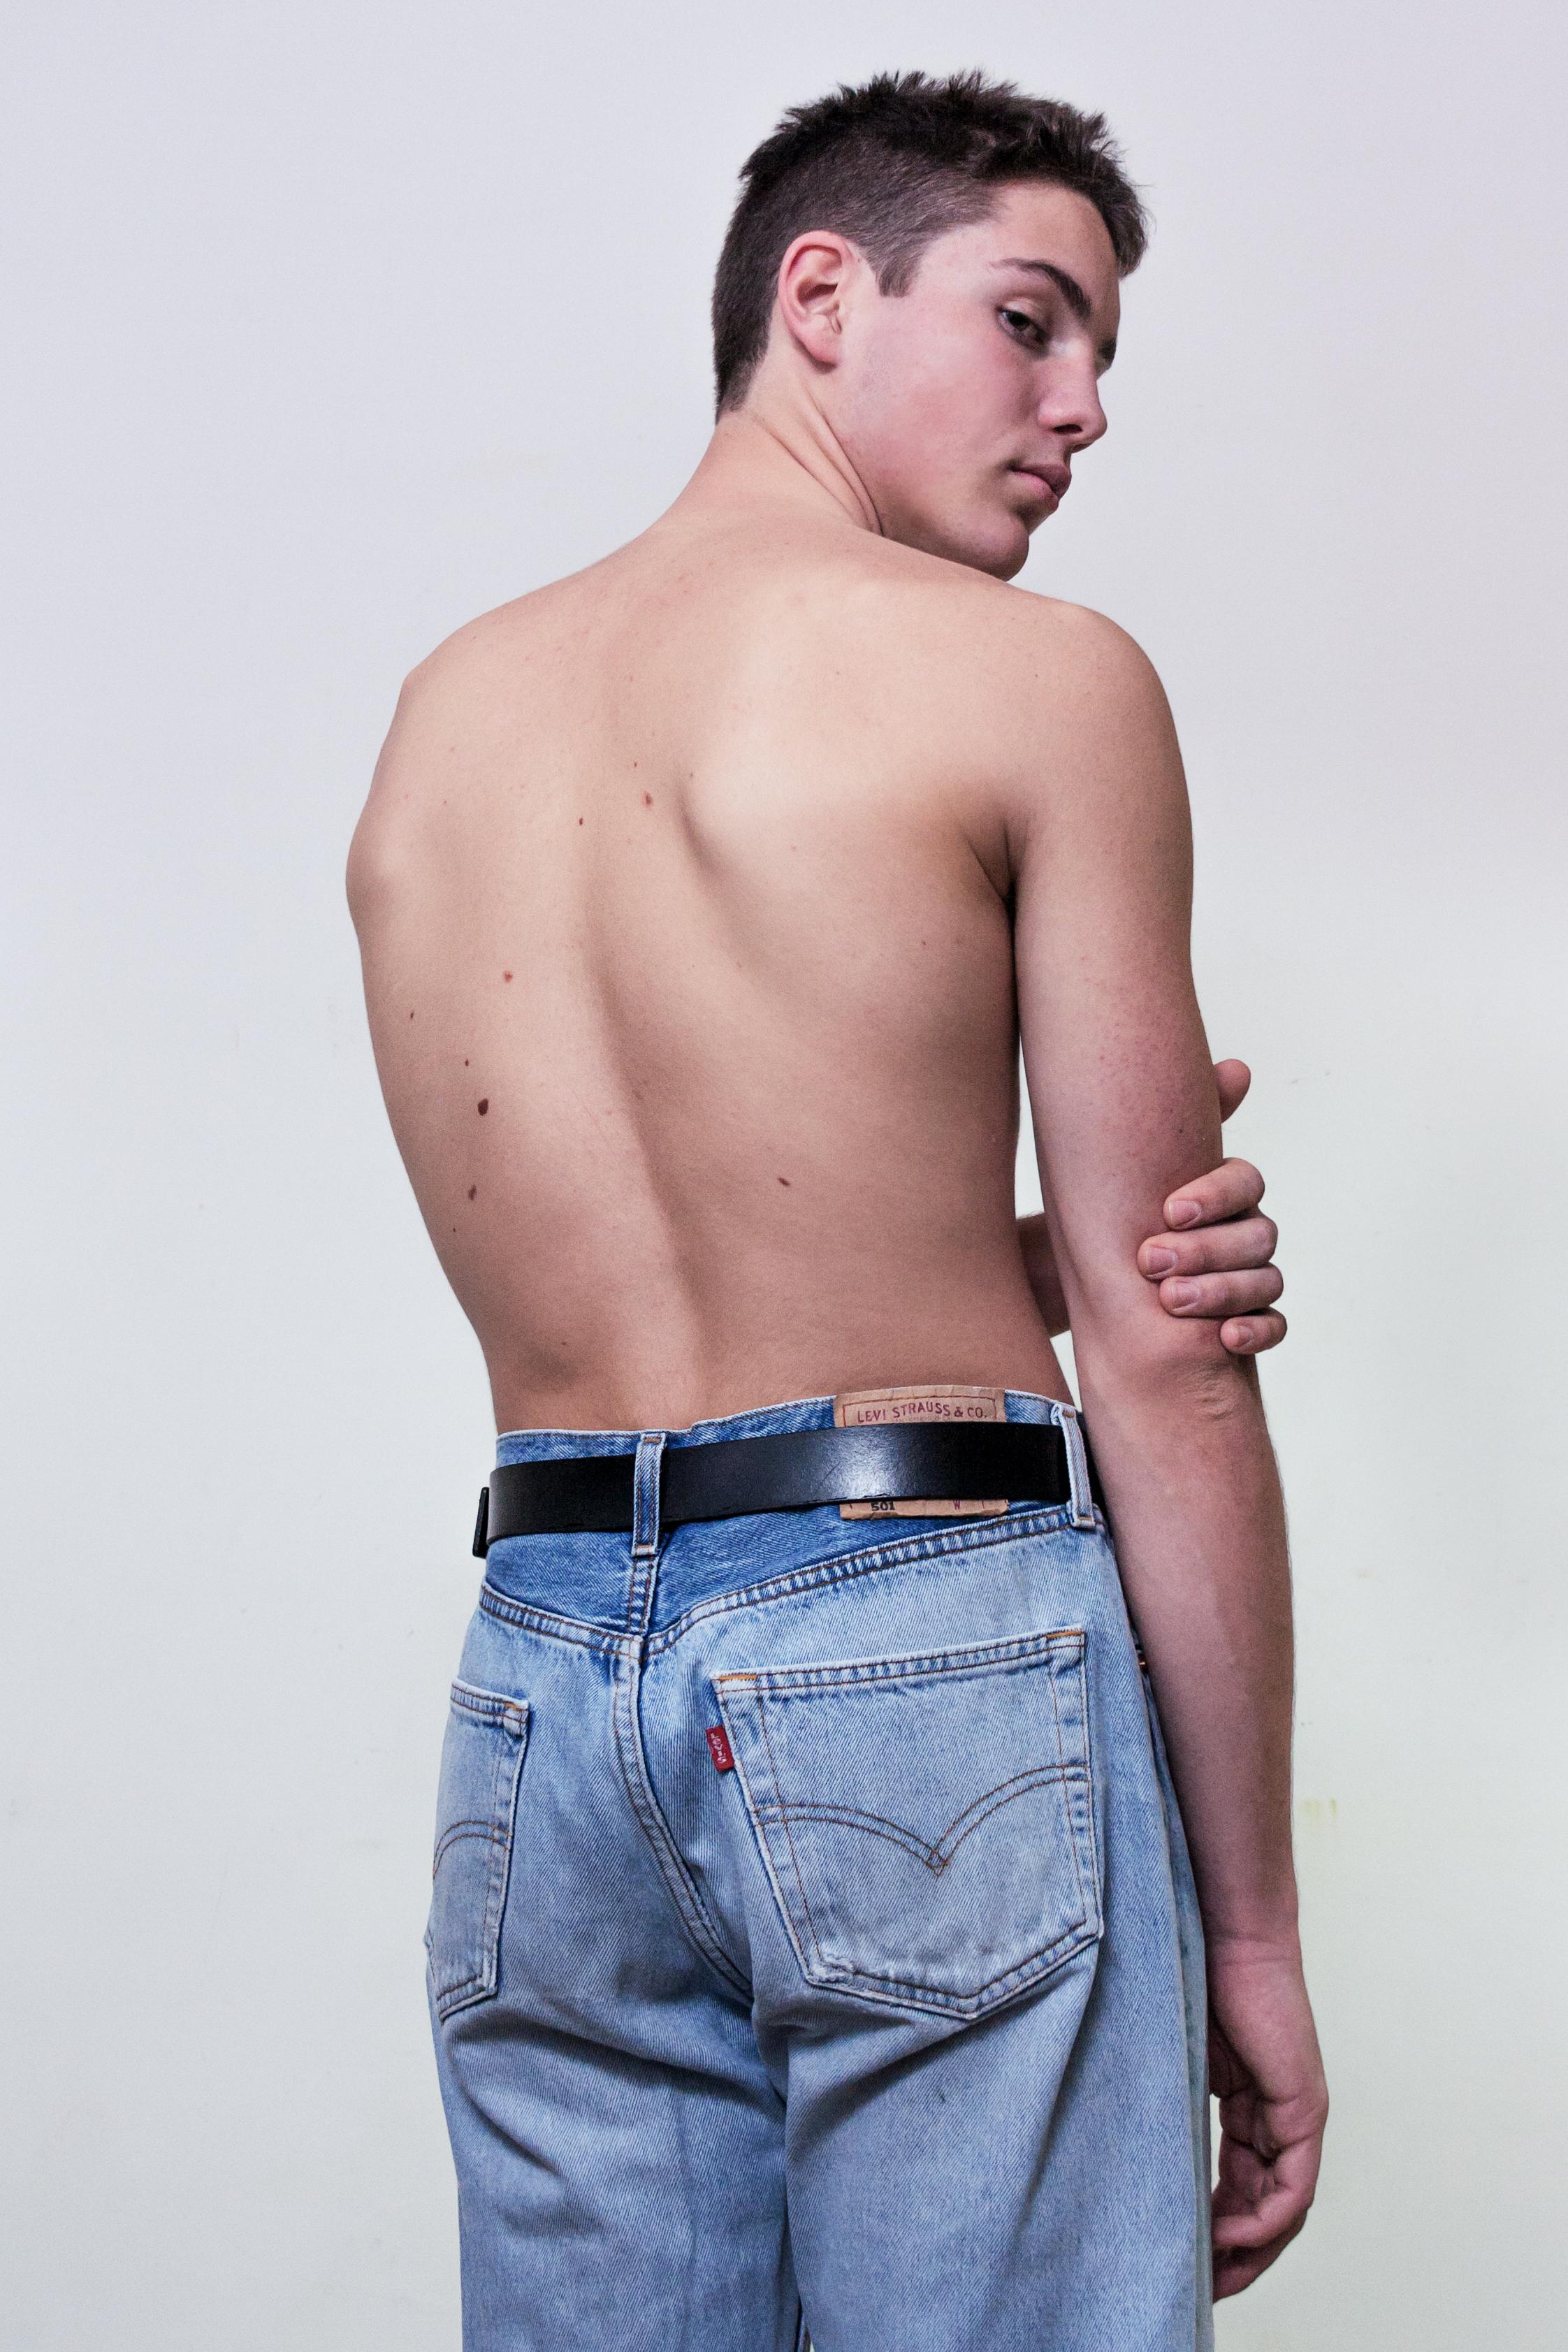 Blue jeans boy 4.jpg